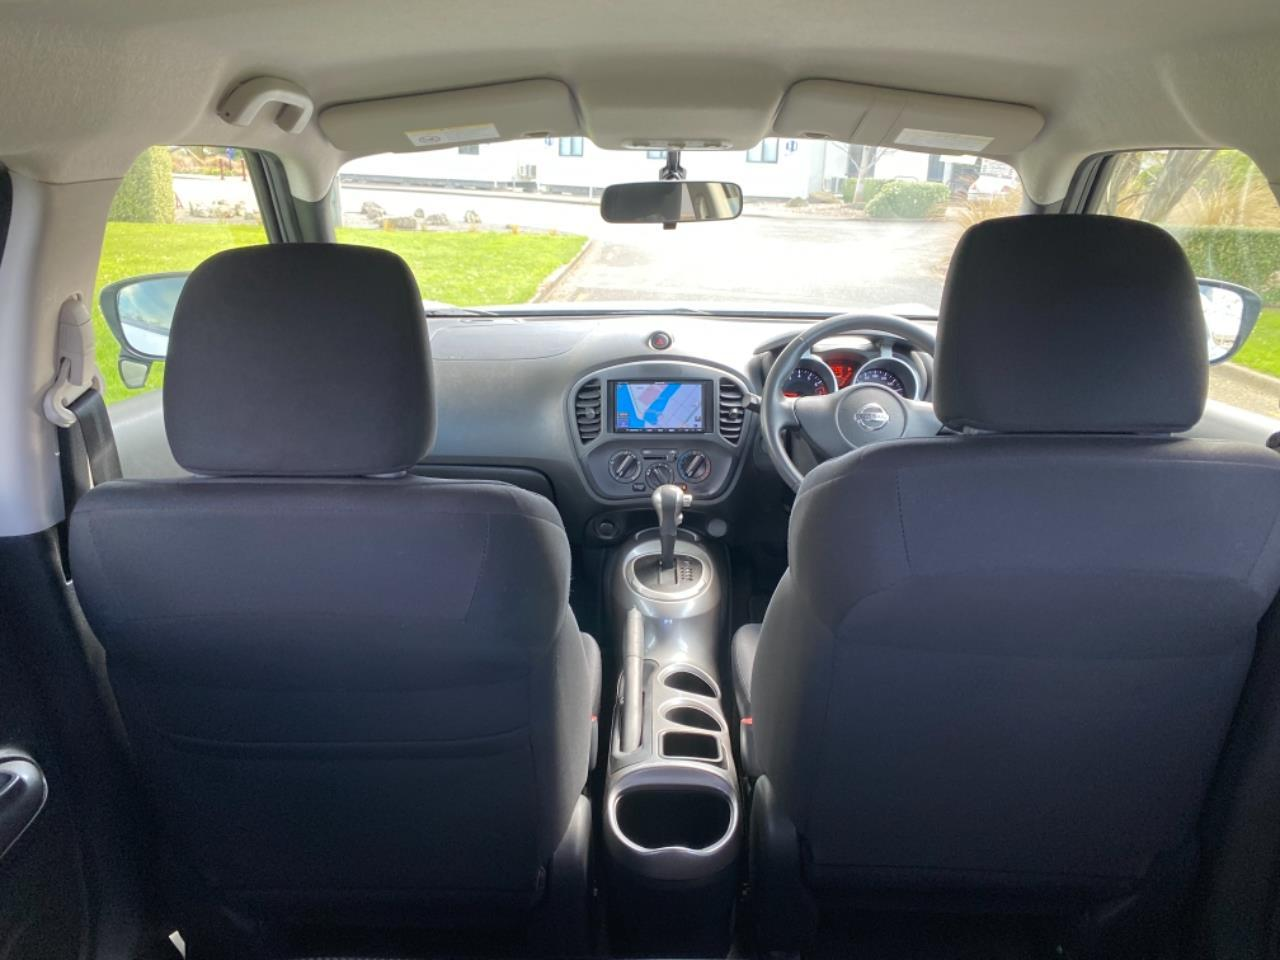 image-7, 2015 Nissan Juke 15 RS at Invercargill